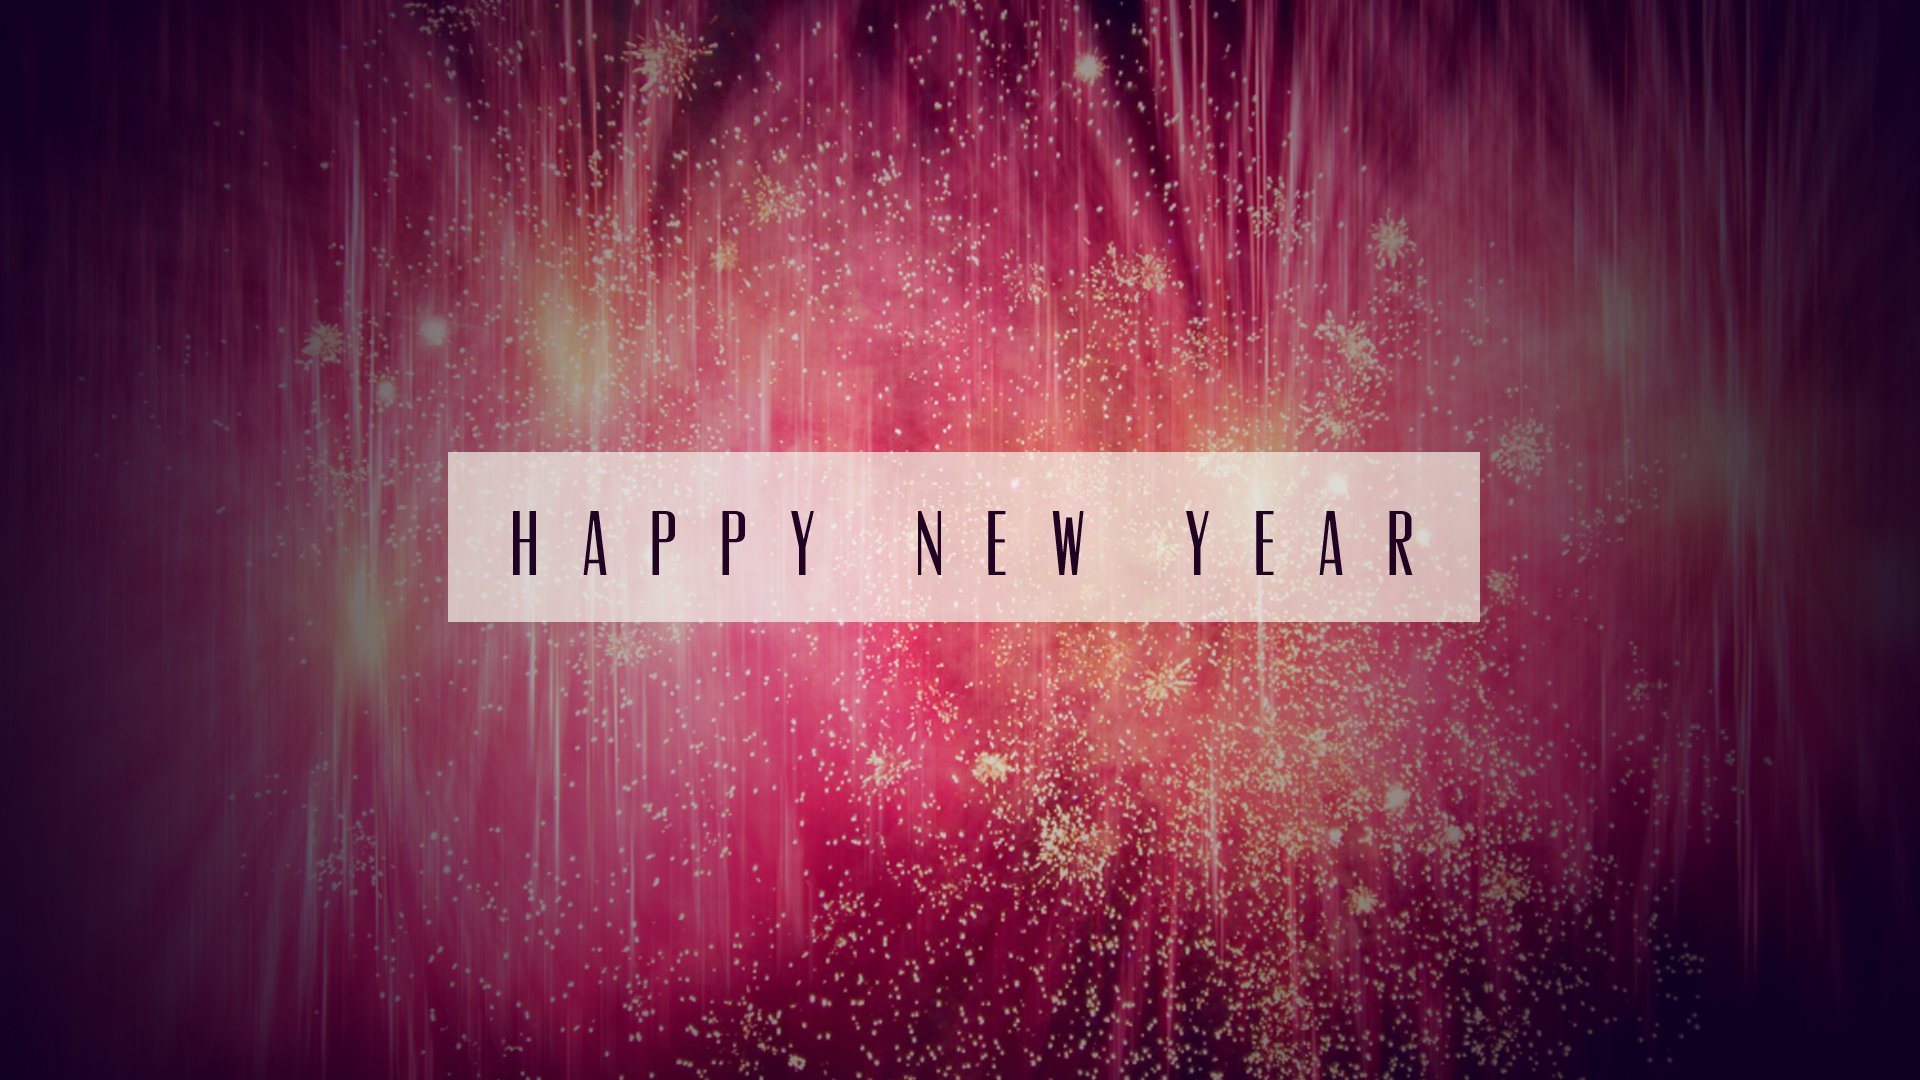 Happy New Year From Starnberg Fellowship!